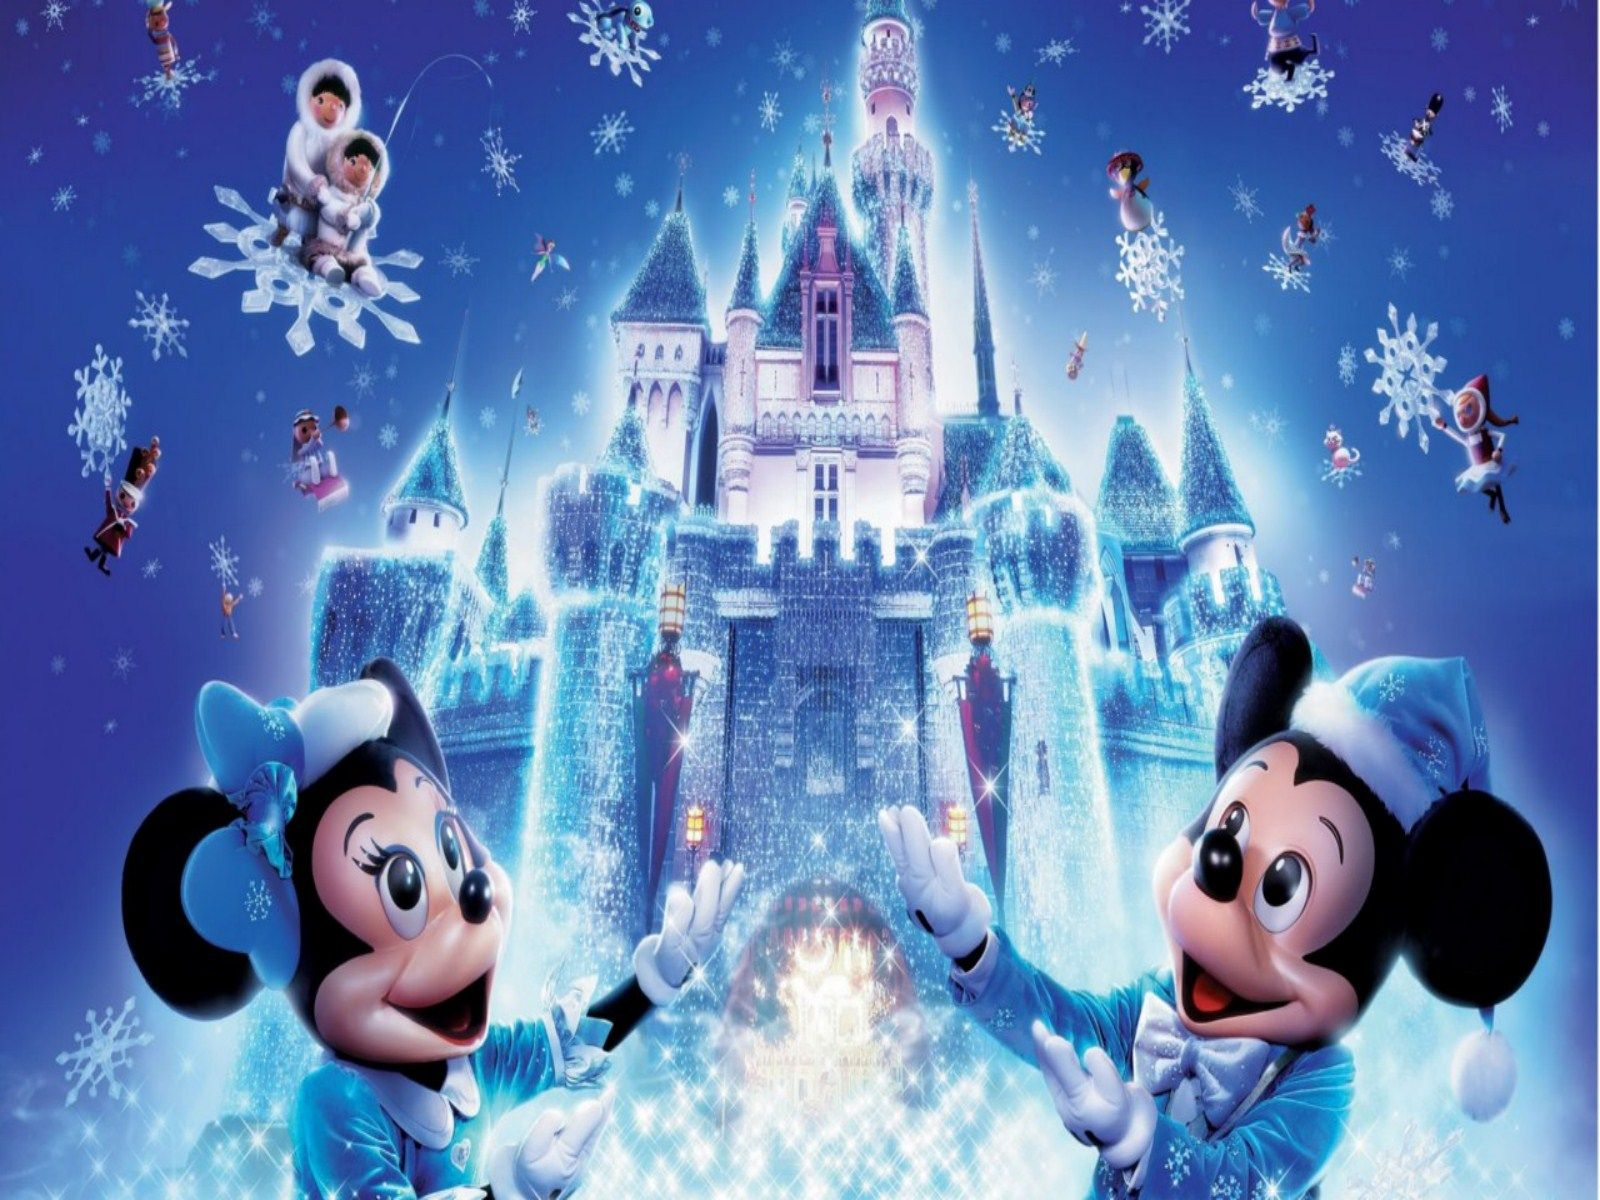 Disney July 4th Wallpaper HD Disney Christmas